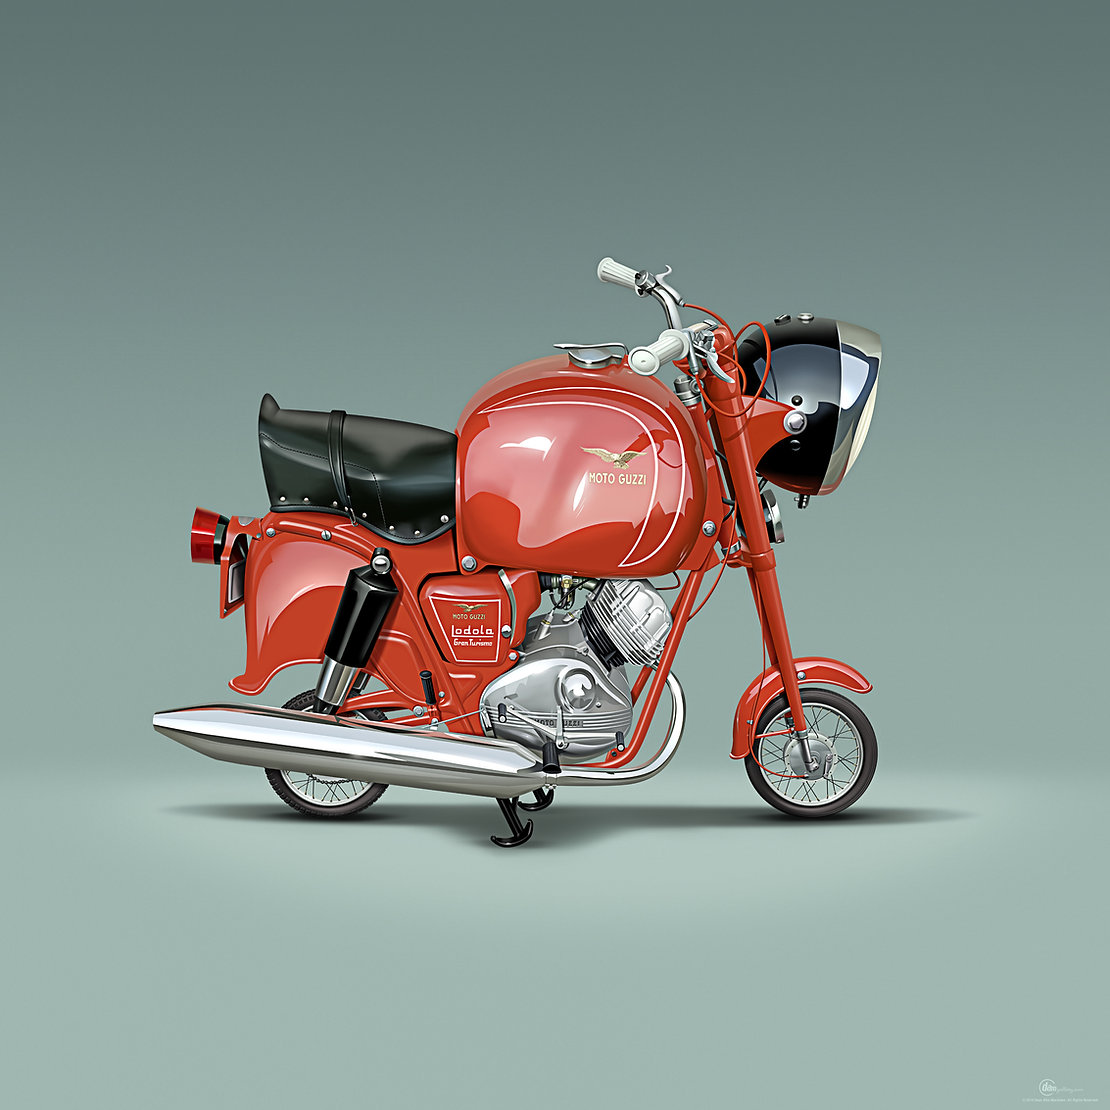 1956 Moto Guzzi Lodola Gran Turismo